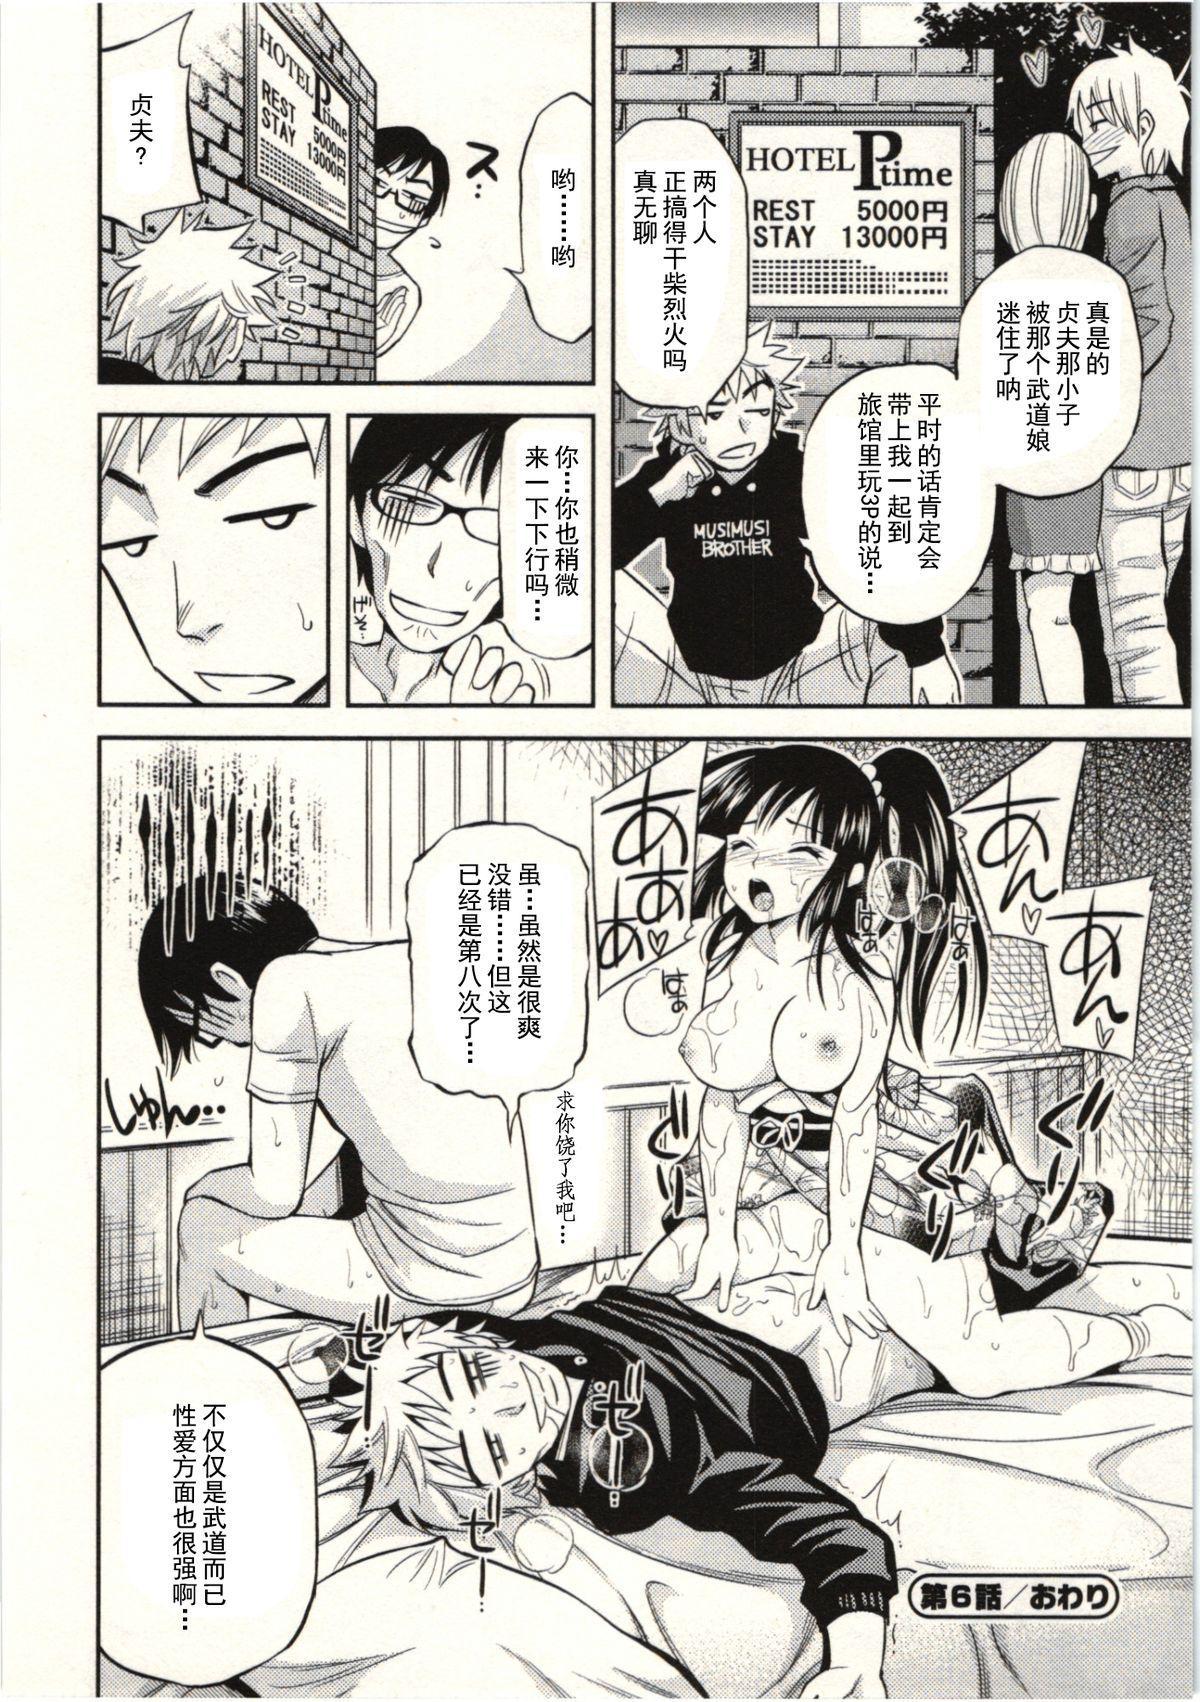 Tadashii Majutsu no Asobikata - The right way of playing of magic. 122